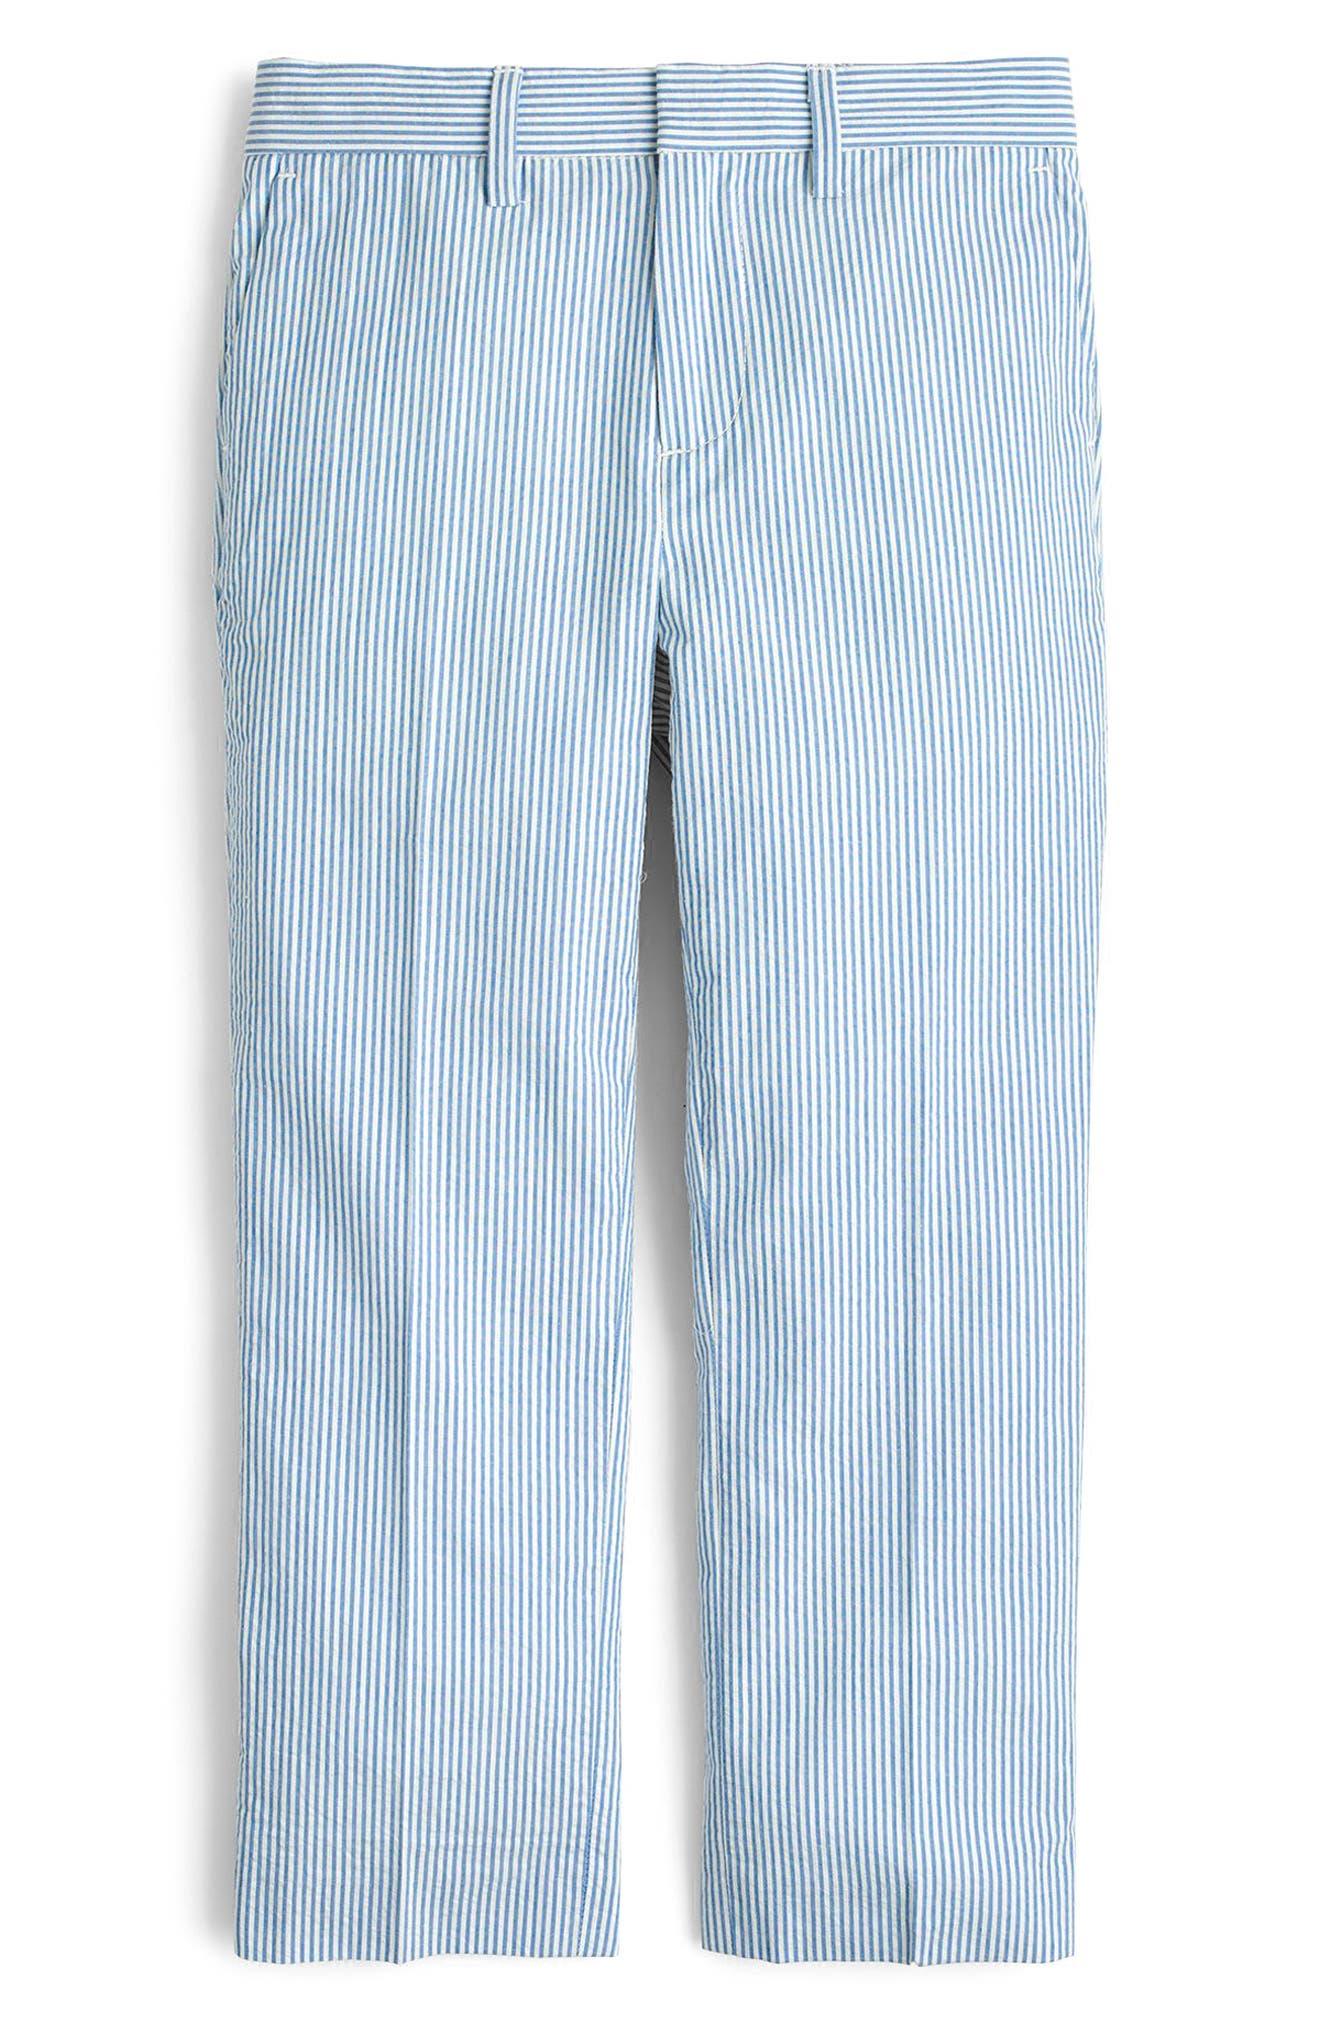 Ludlow Seersucker Pants,                             Main thumbnail 1, color,                             400